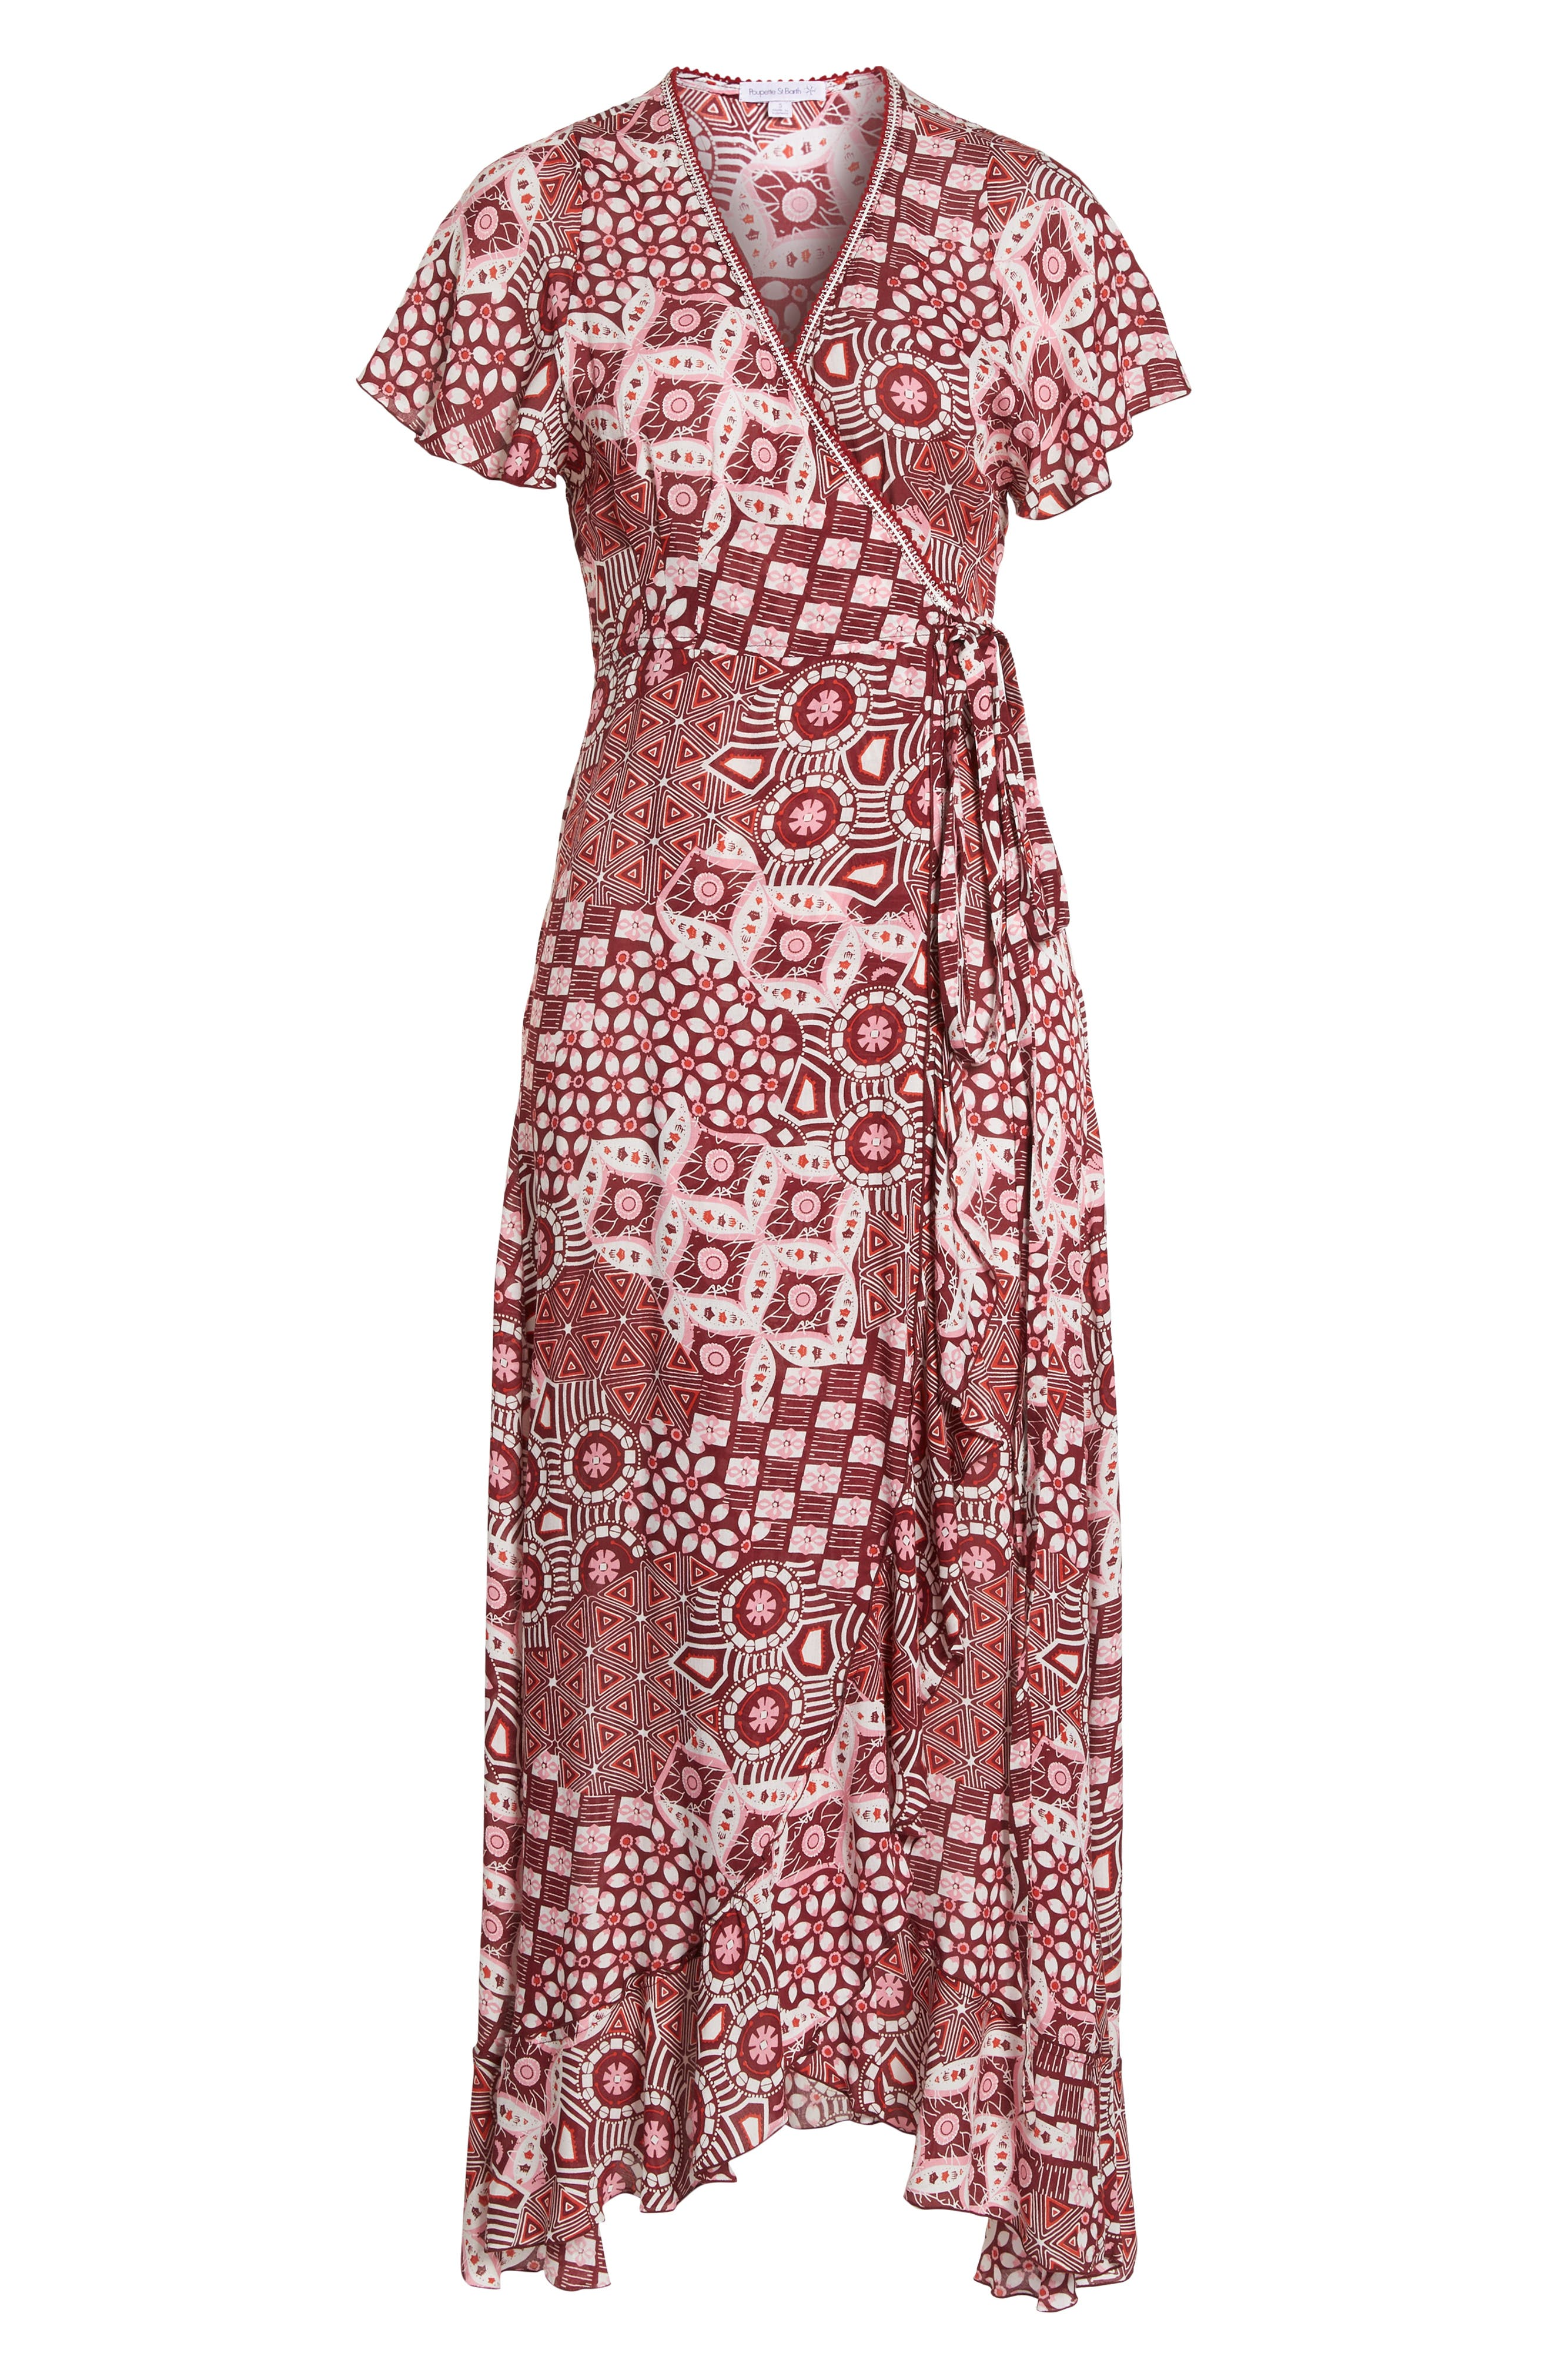 Poupette St. Barth Joe Cover-Up Maxi Dress,                             Alternate thumbnail 6, color,                             650